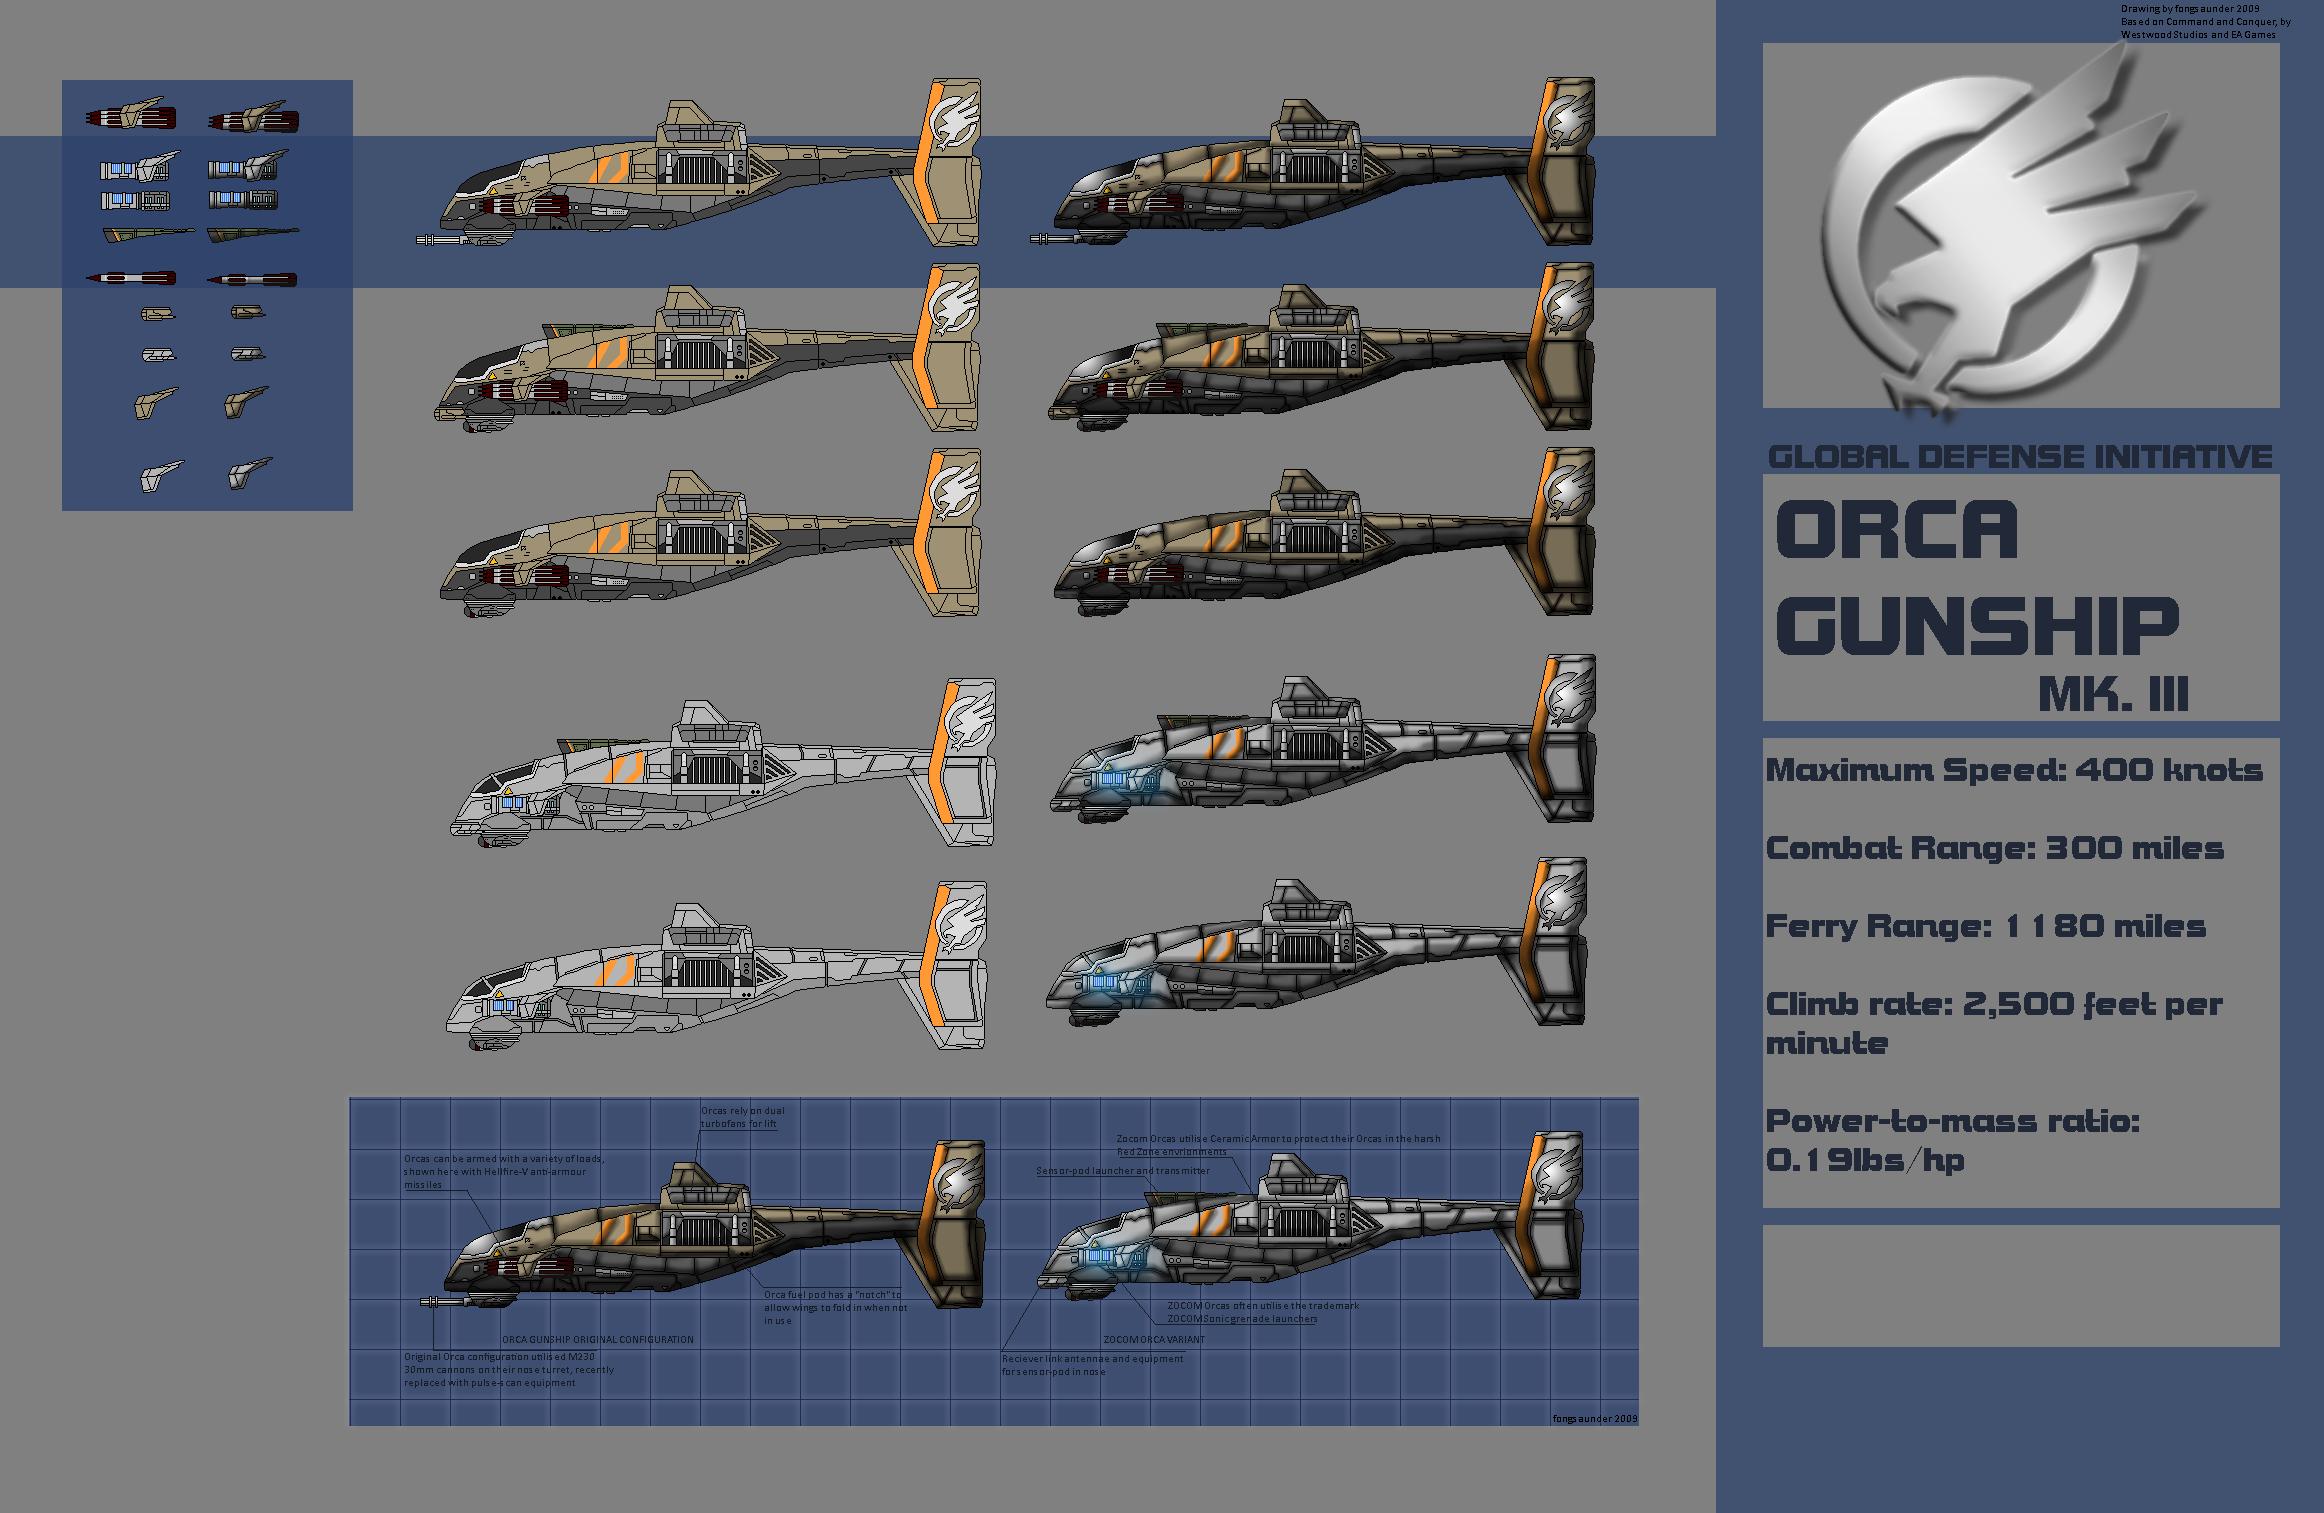 Orca Gunship Mk.III by fongsaunder